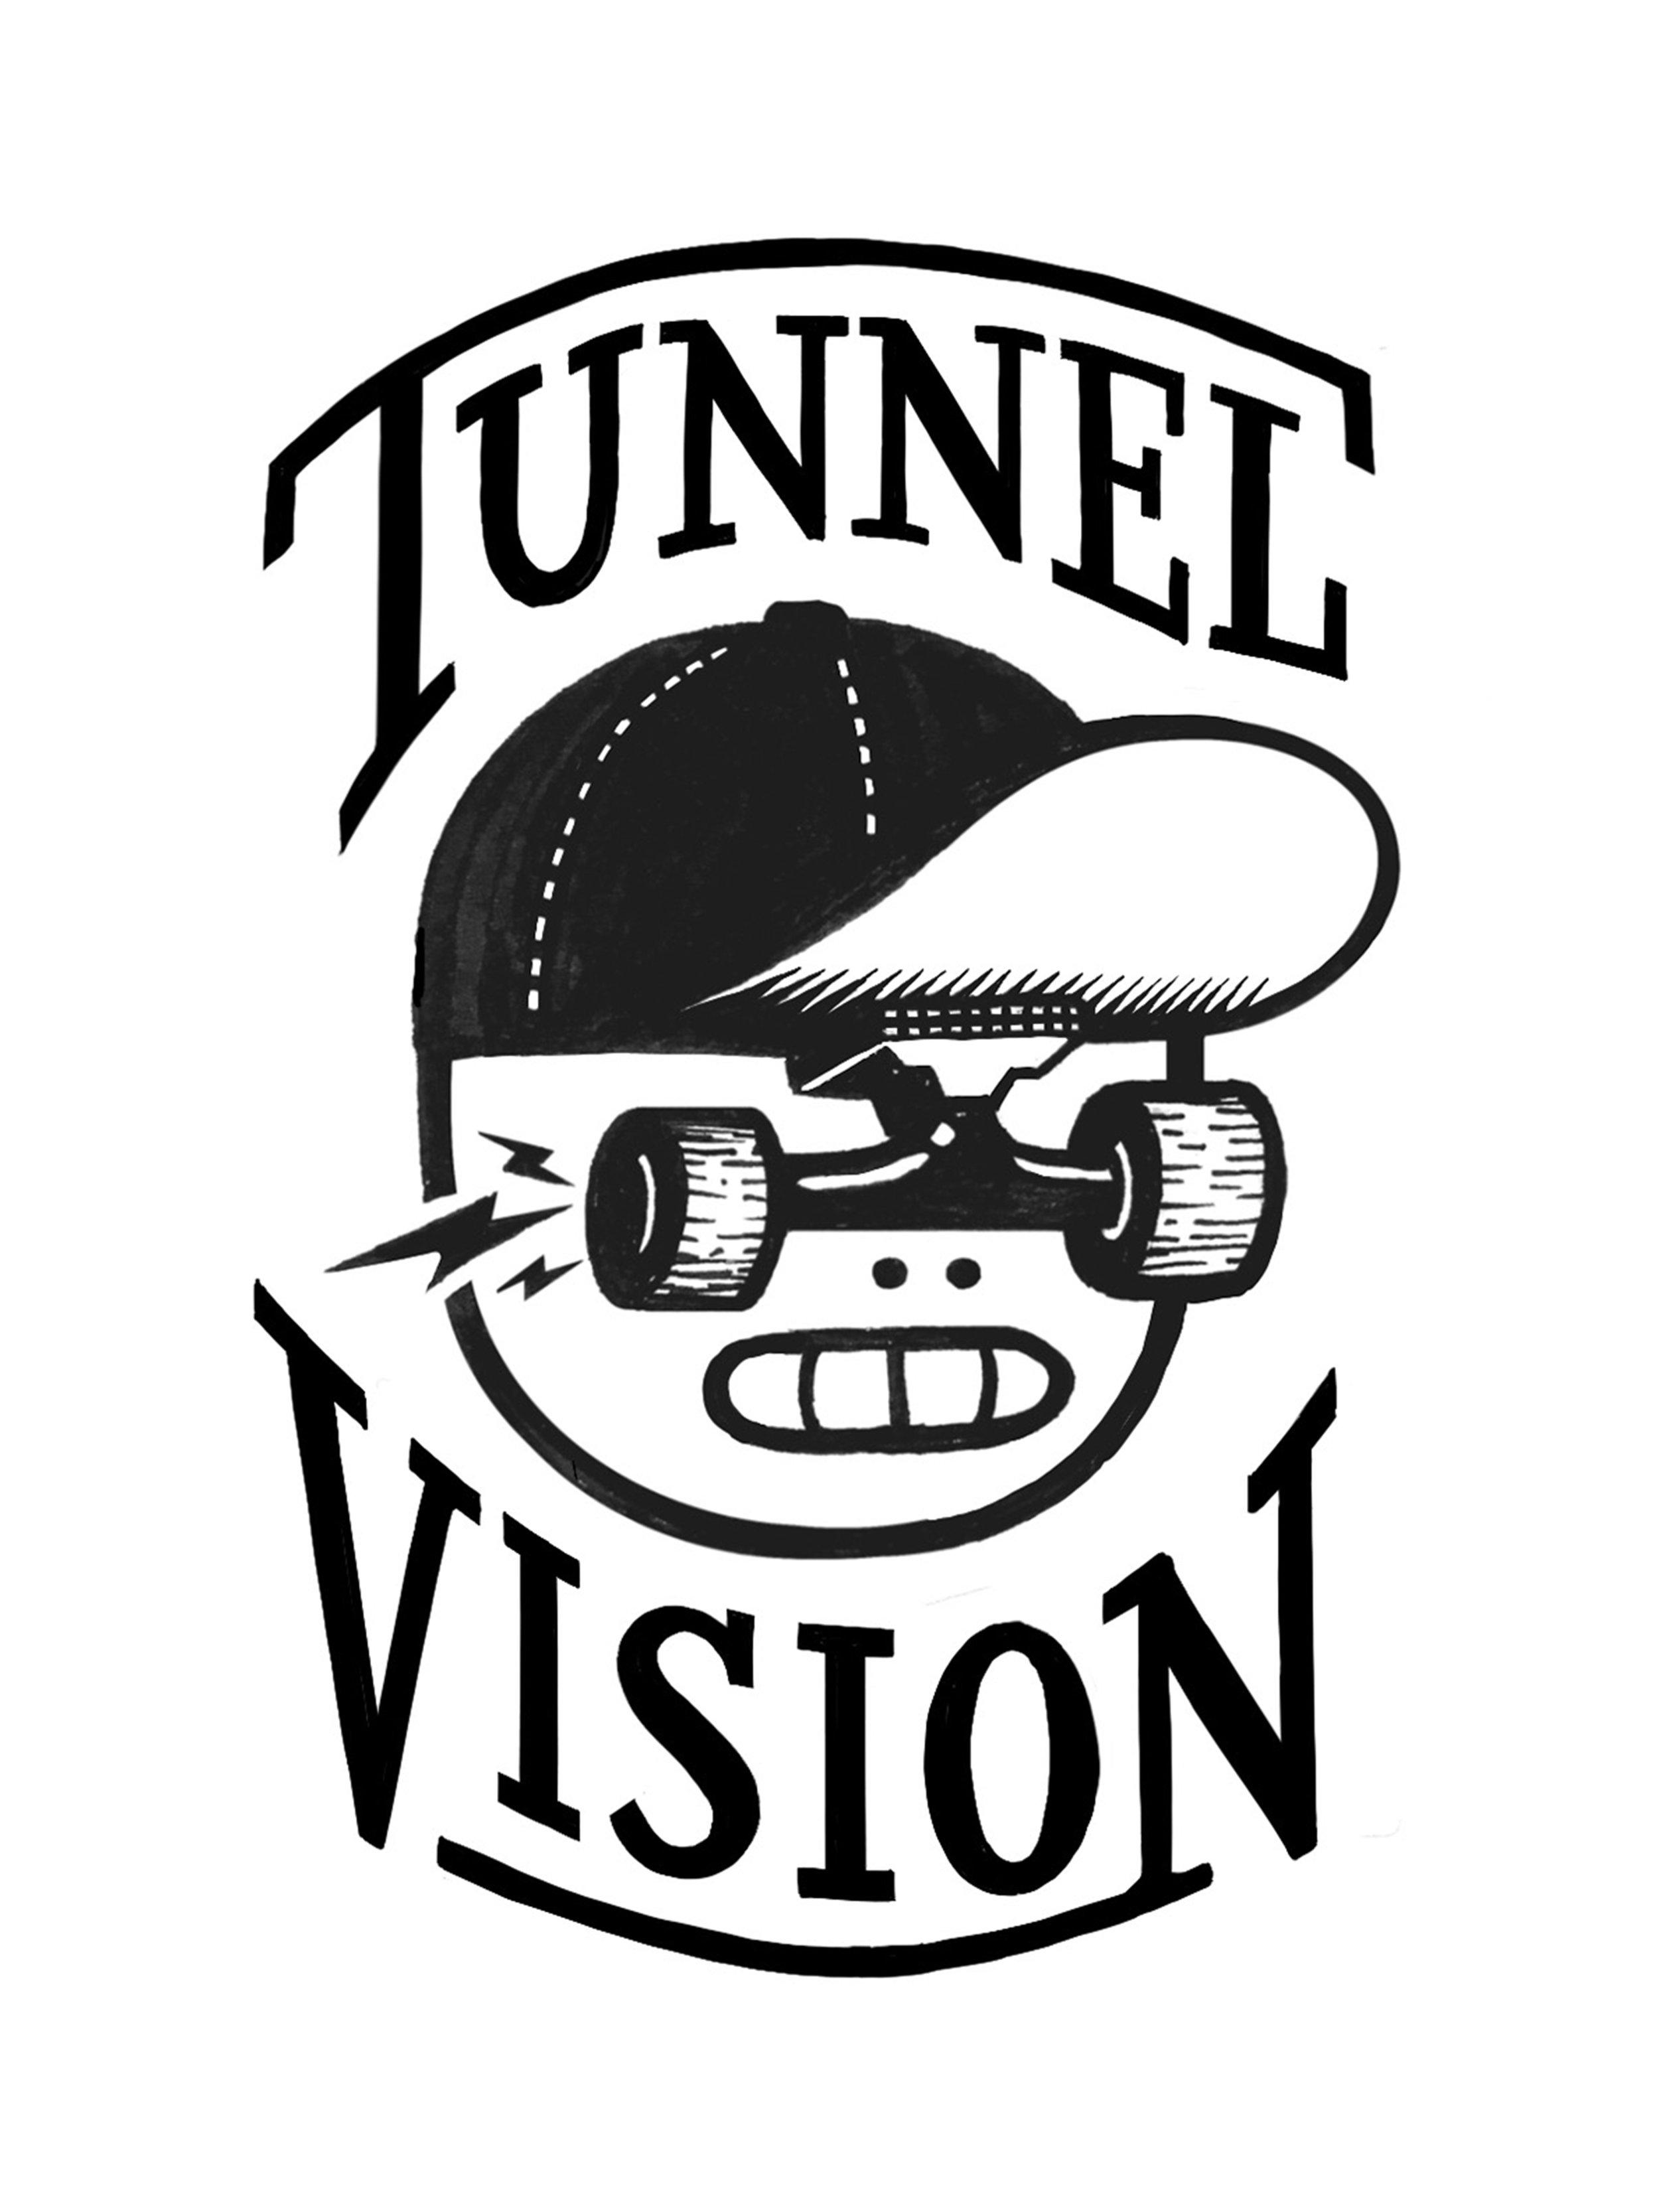 tunnelvision-9x12.jpg